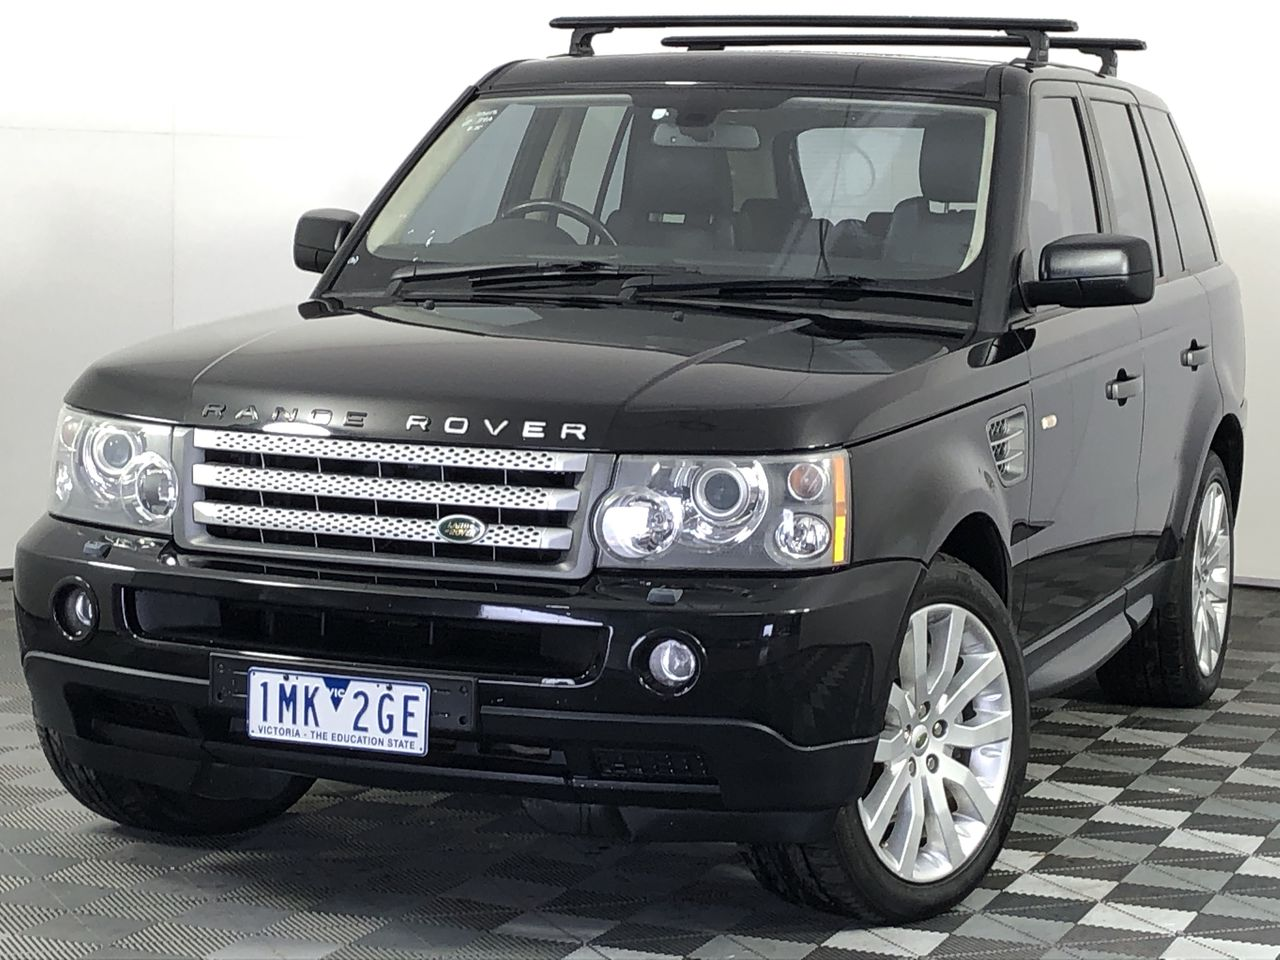 2009 Land Rover Range Rover Sport TDV8 Turbo Diesel Automatic Wagon